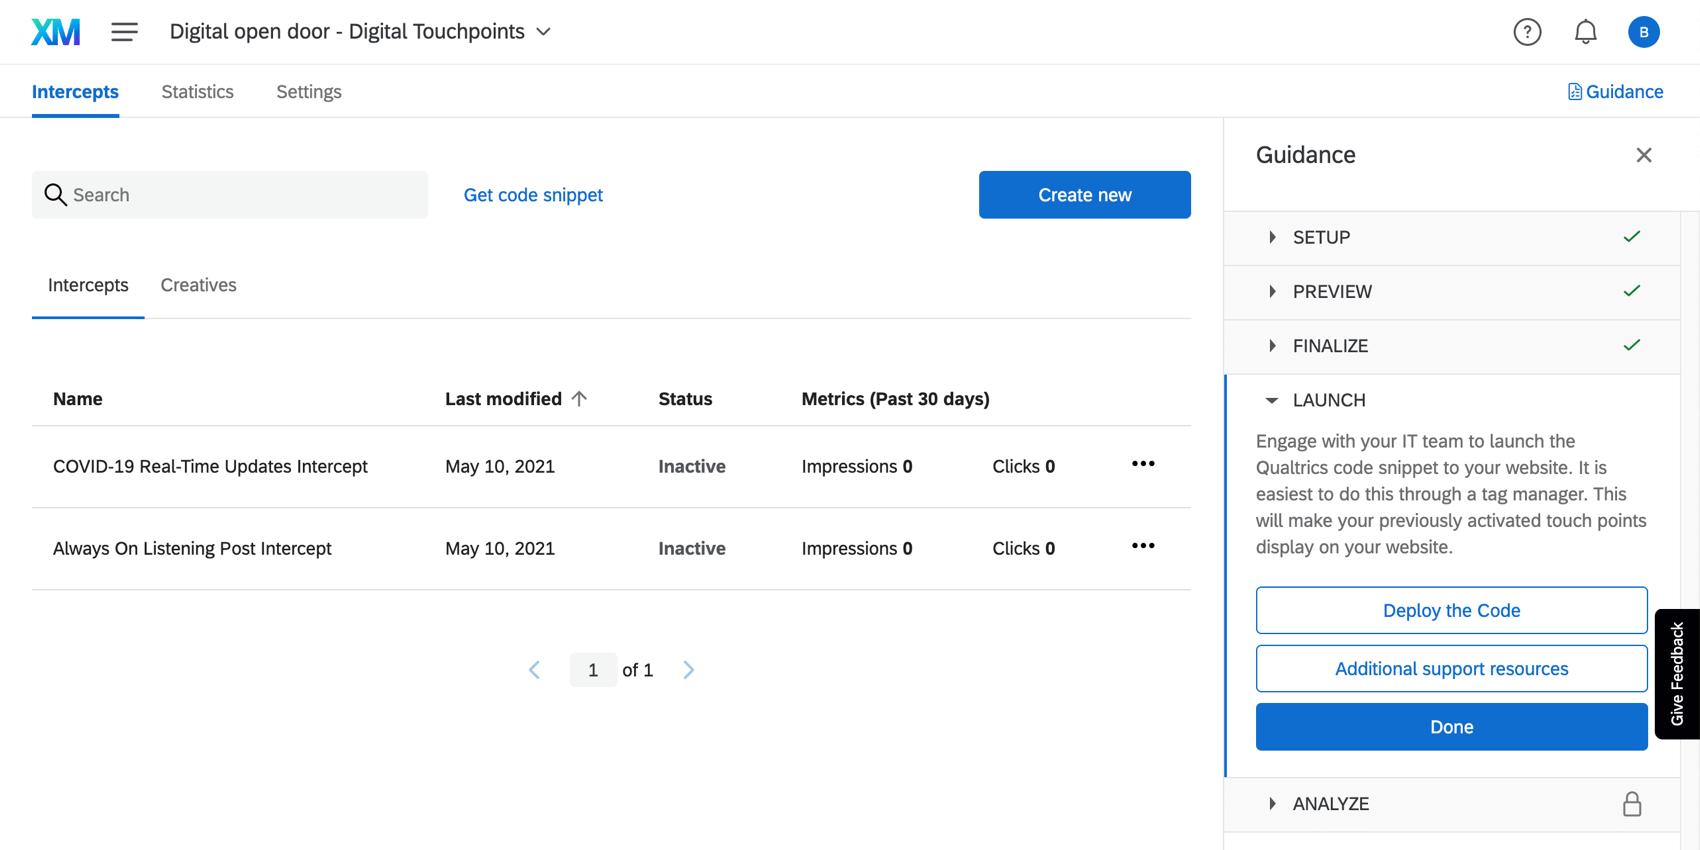 Intercepts section of the intercepts tab